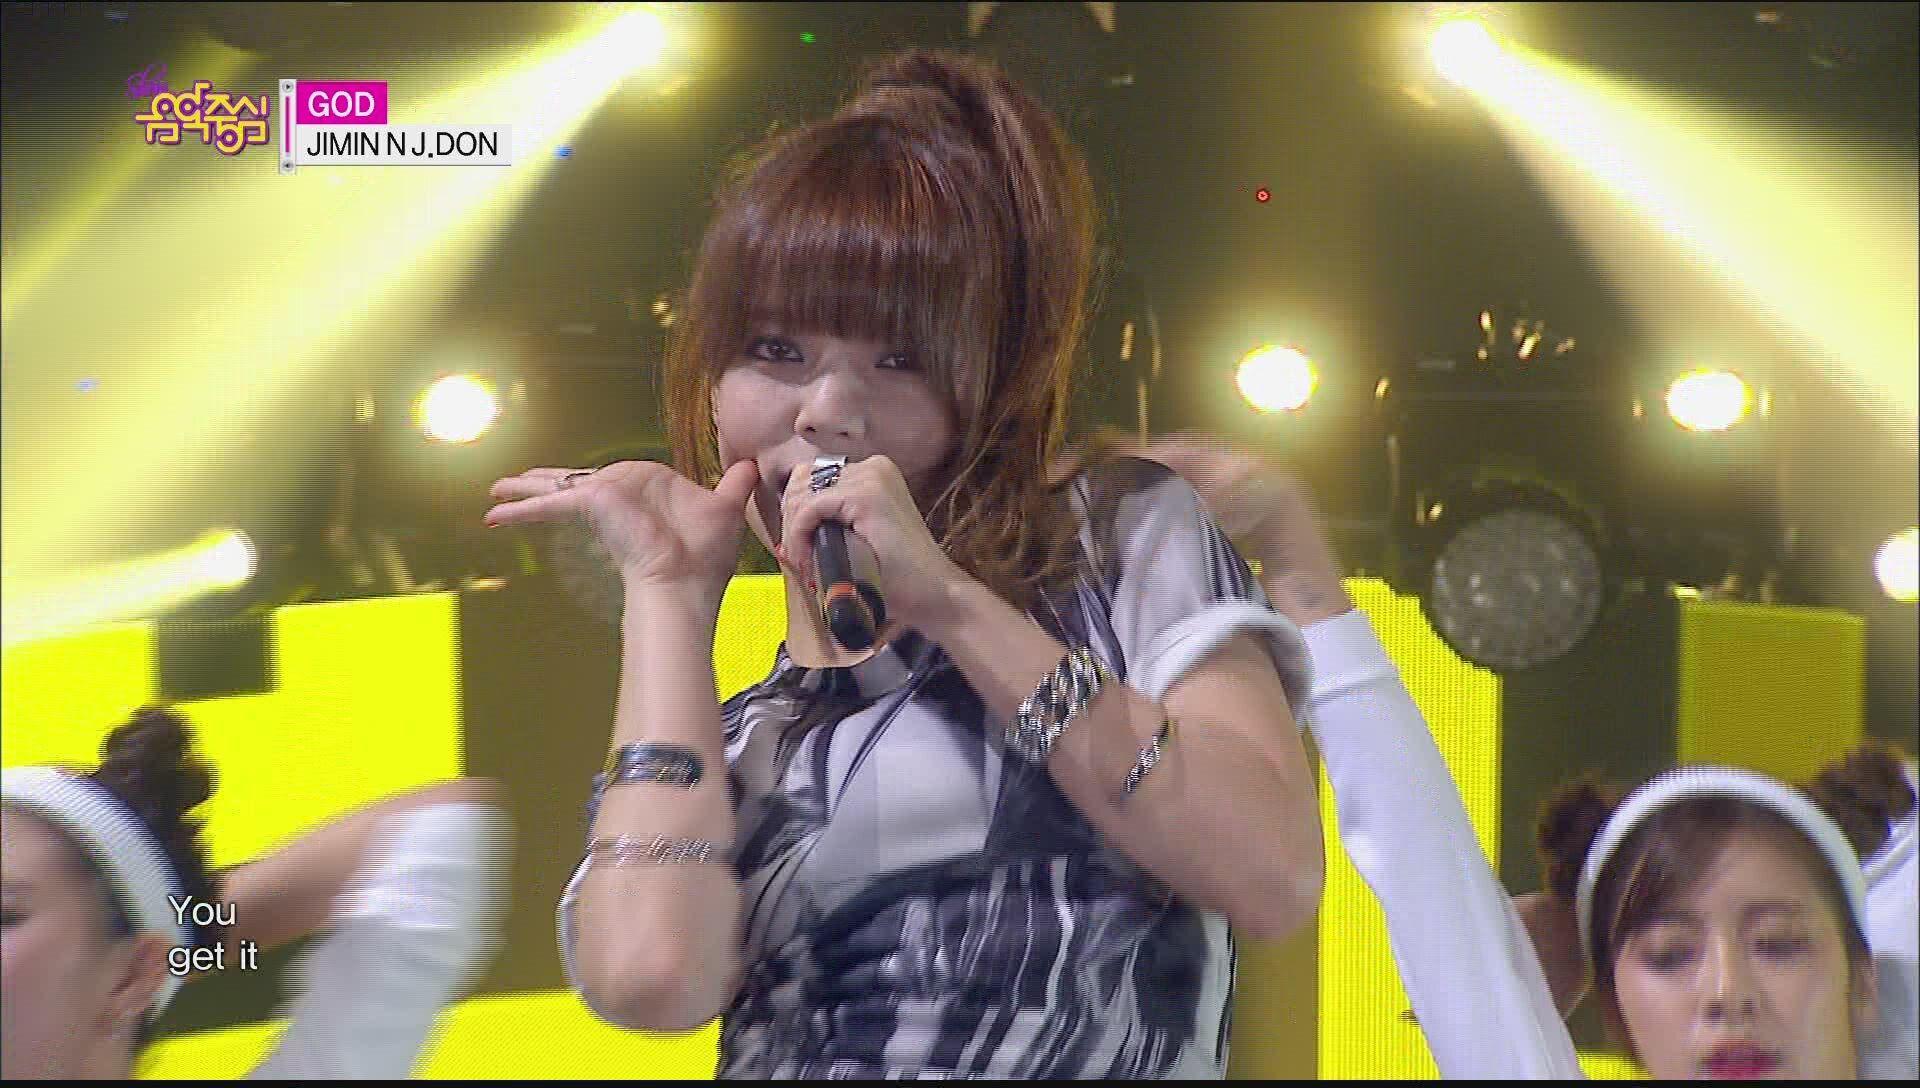 [HOT] JIMIN N J.DON - GOD, 지민 엔 제이던 - 갓, Show Music core 20150502